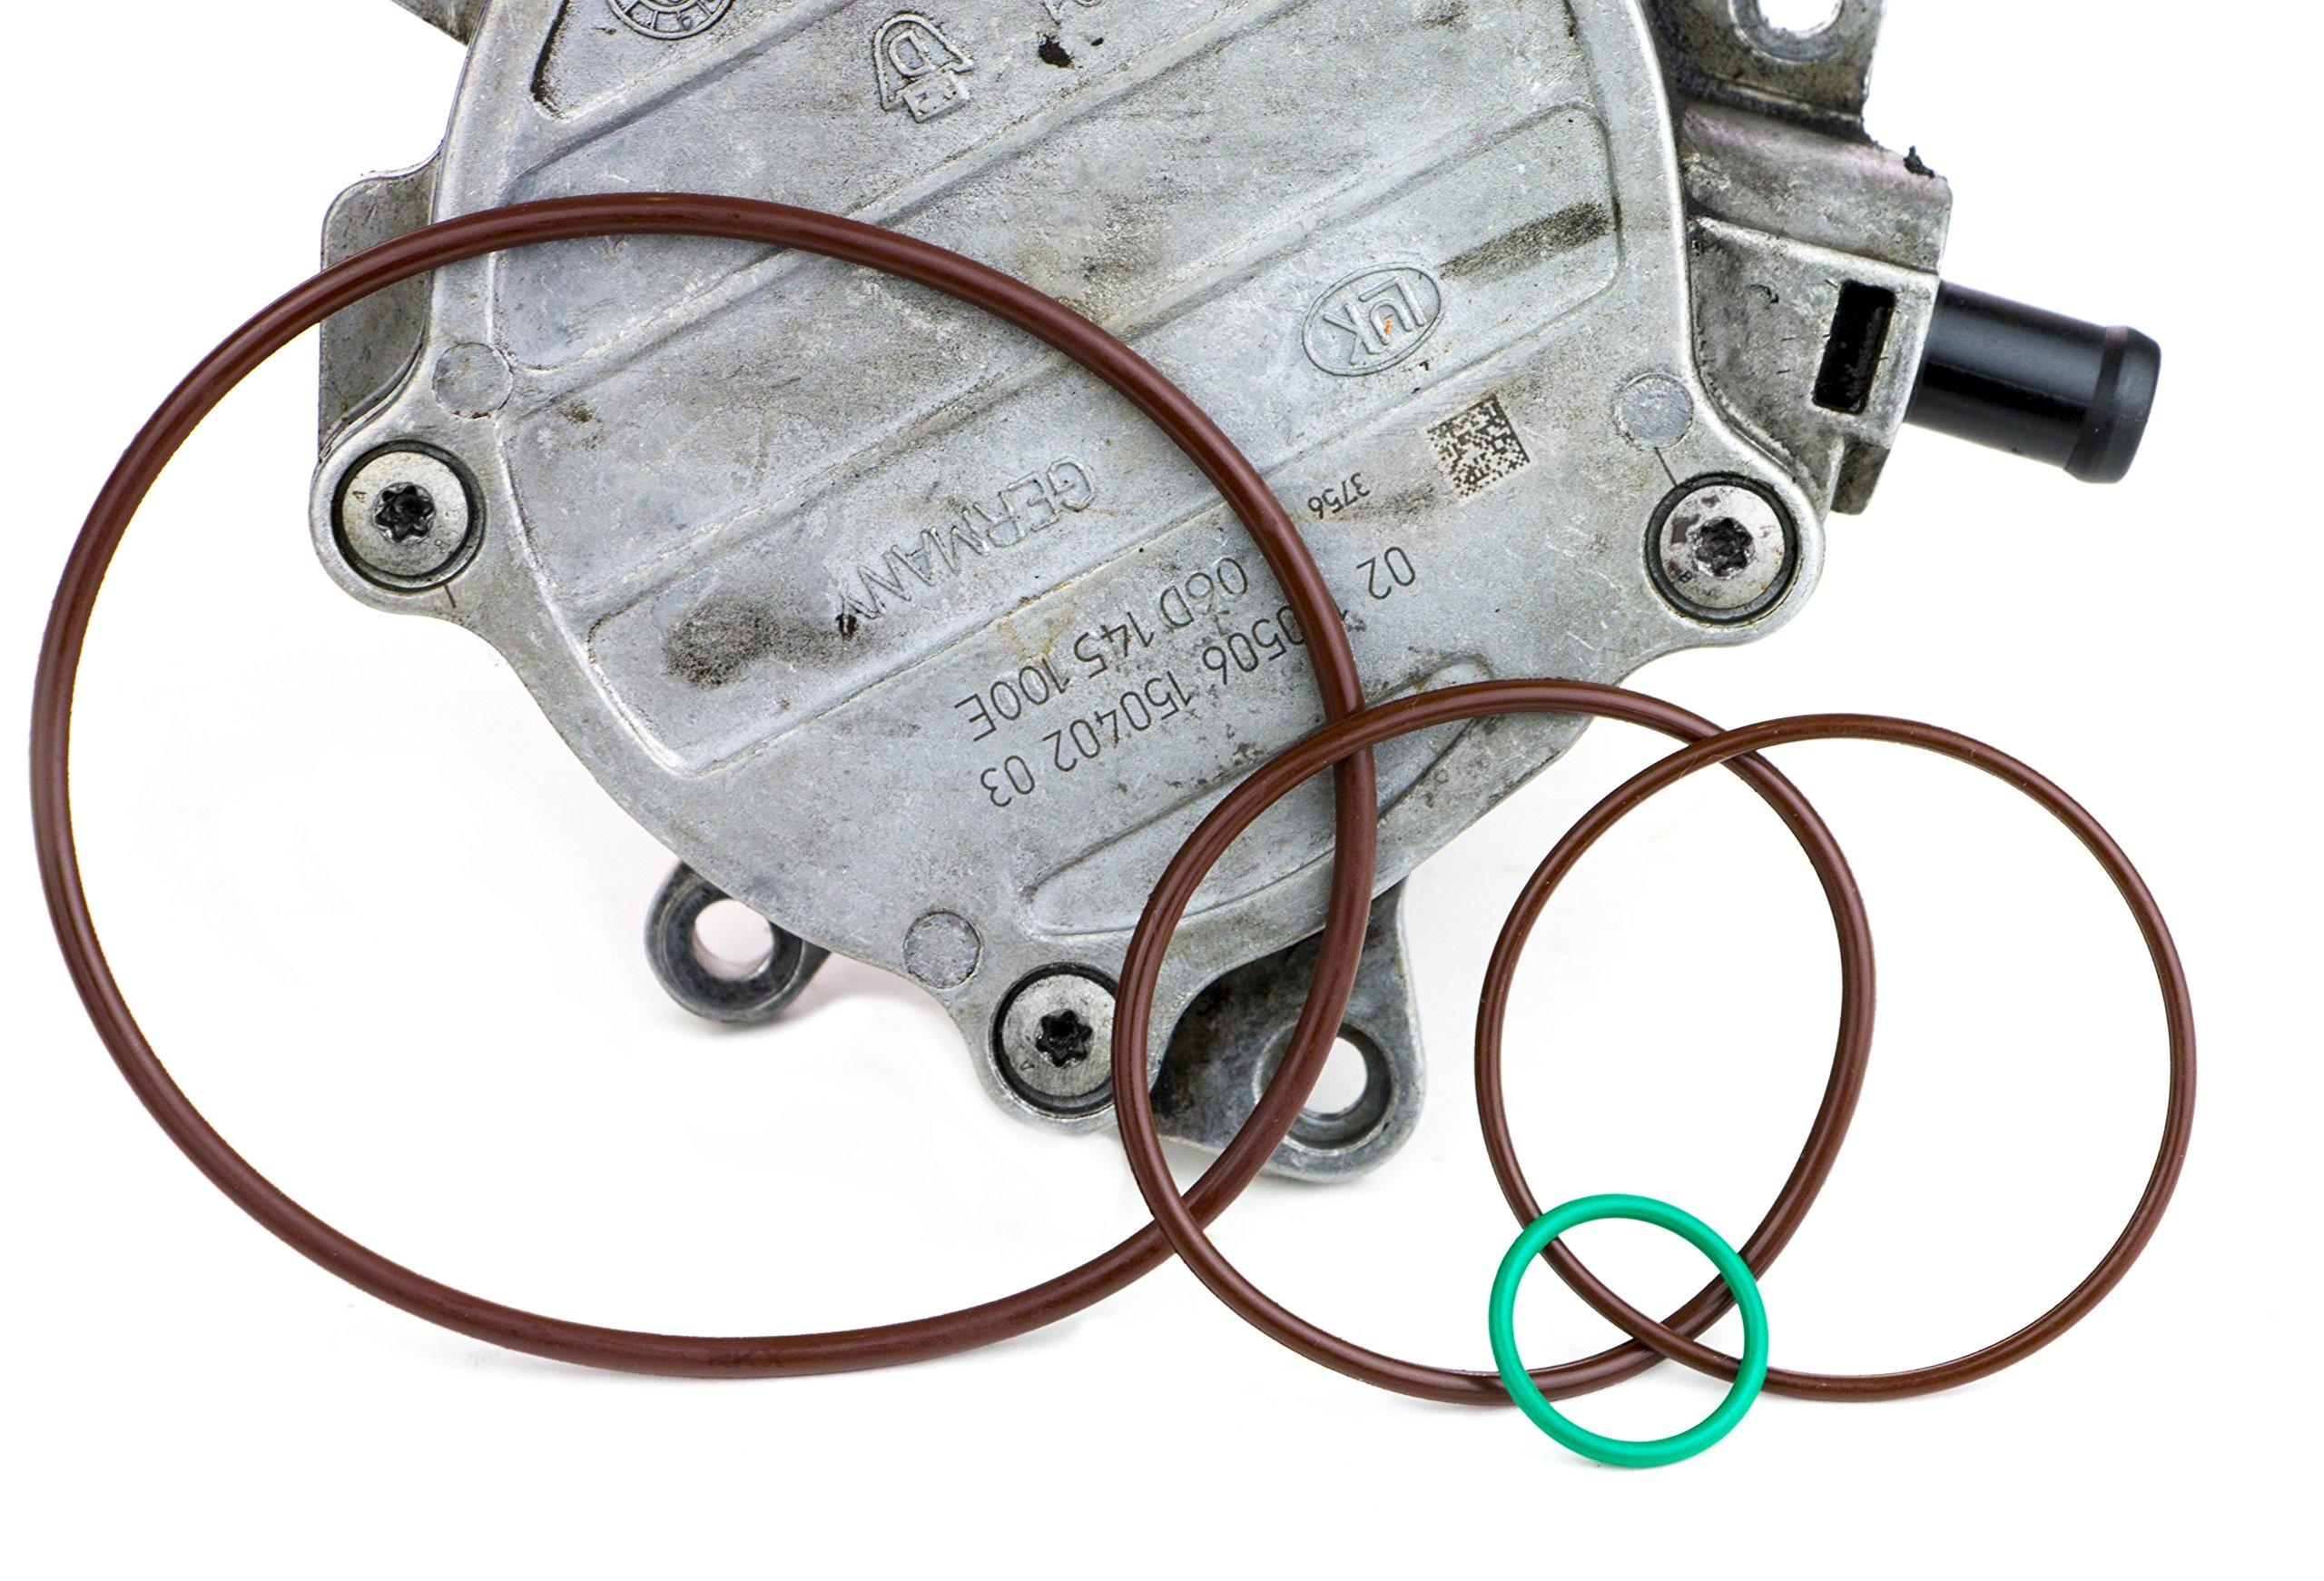 RKX VW & Audi 2.0T Vacuum Pump Reseal / Rebuild Kit 2.0 T MKv, B6, 8P, B7 gasket